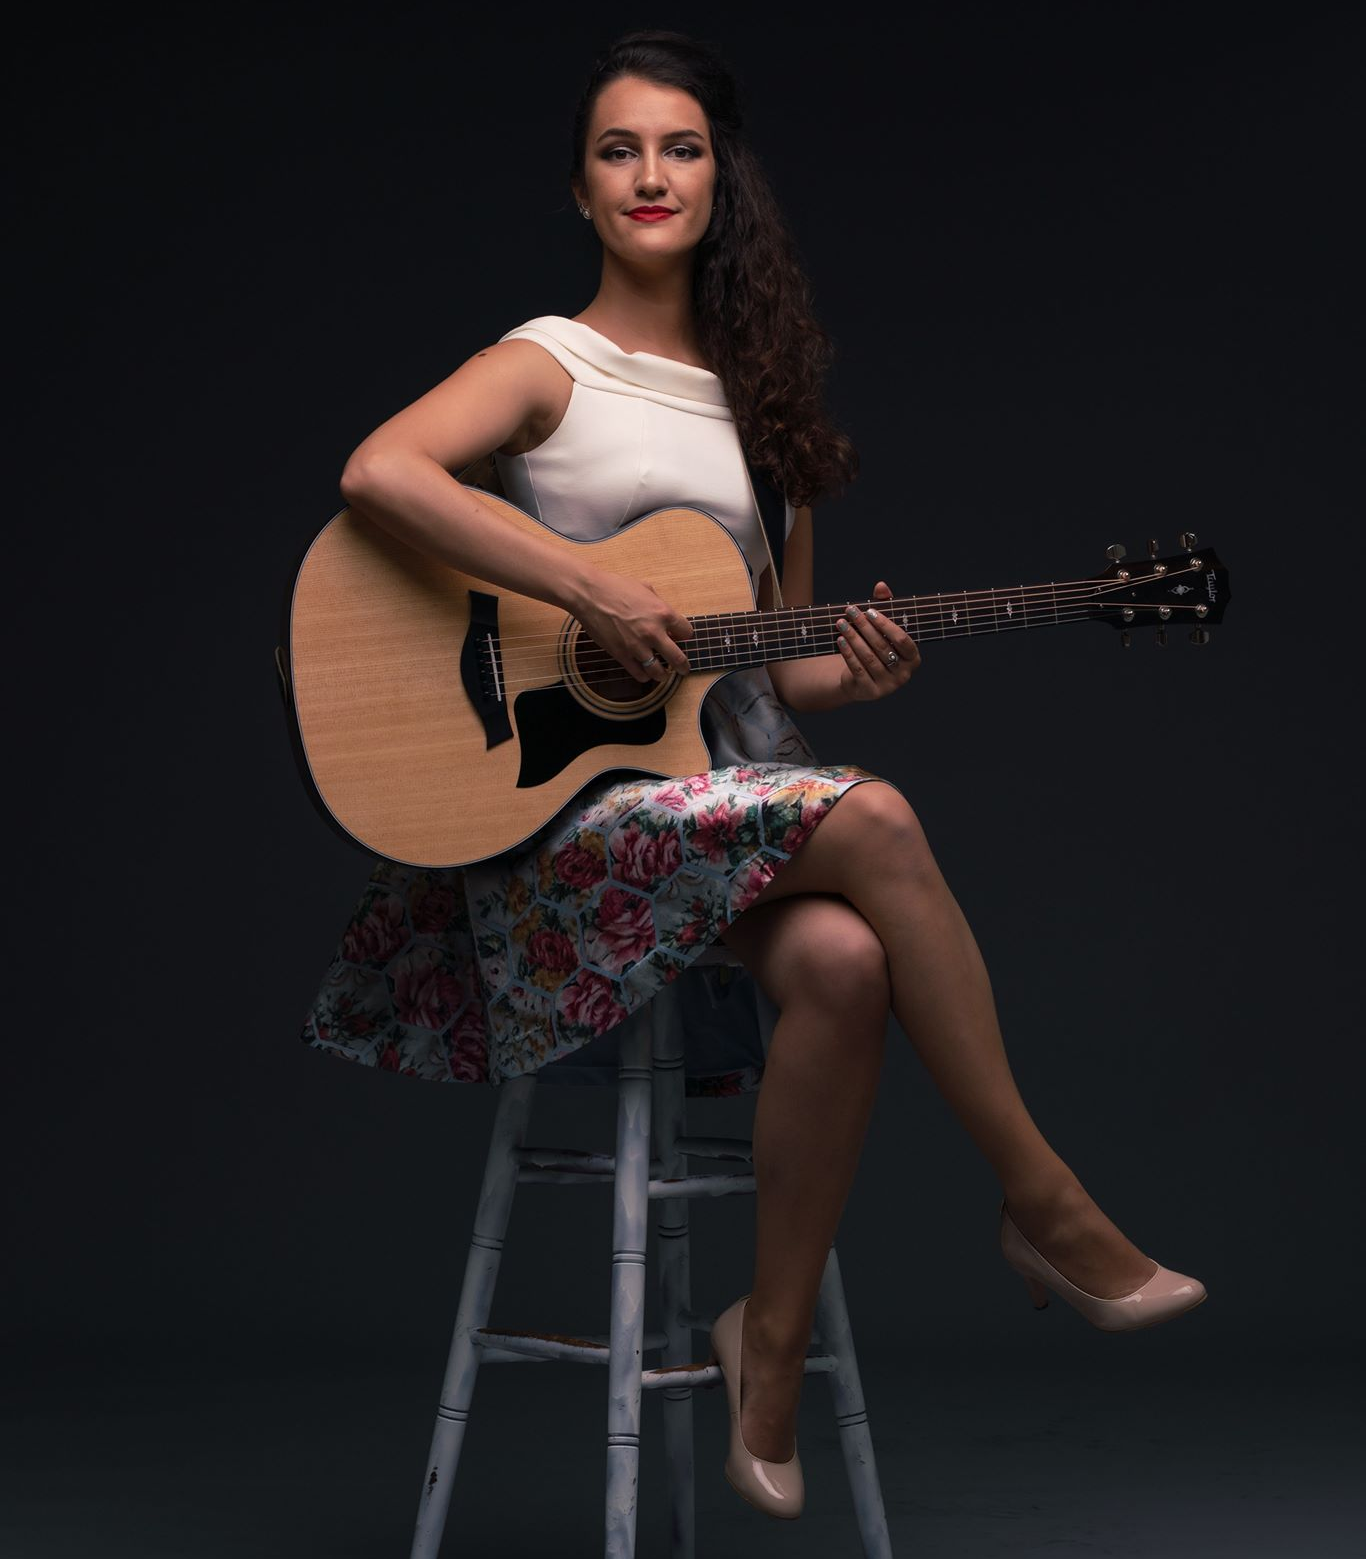 Neli Harper guitarist, online free tips, scale exercise